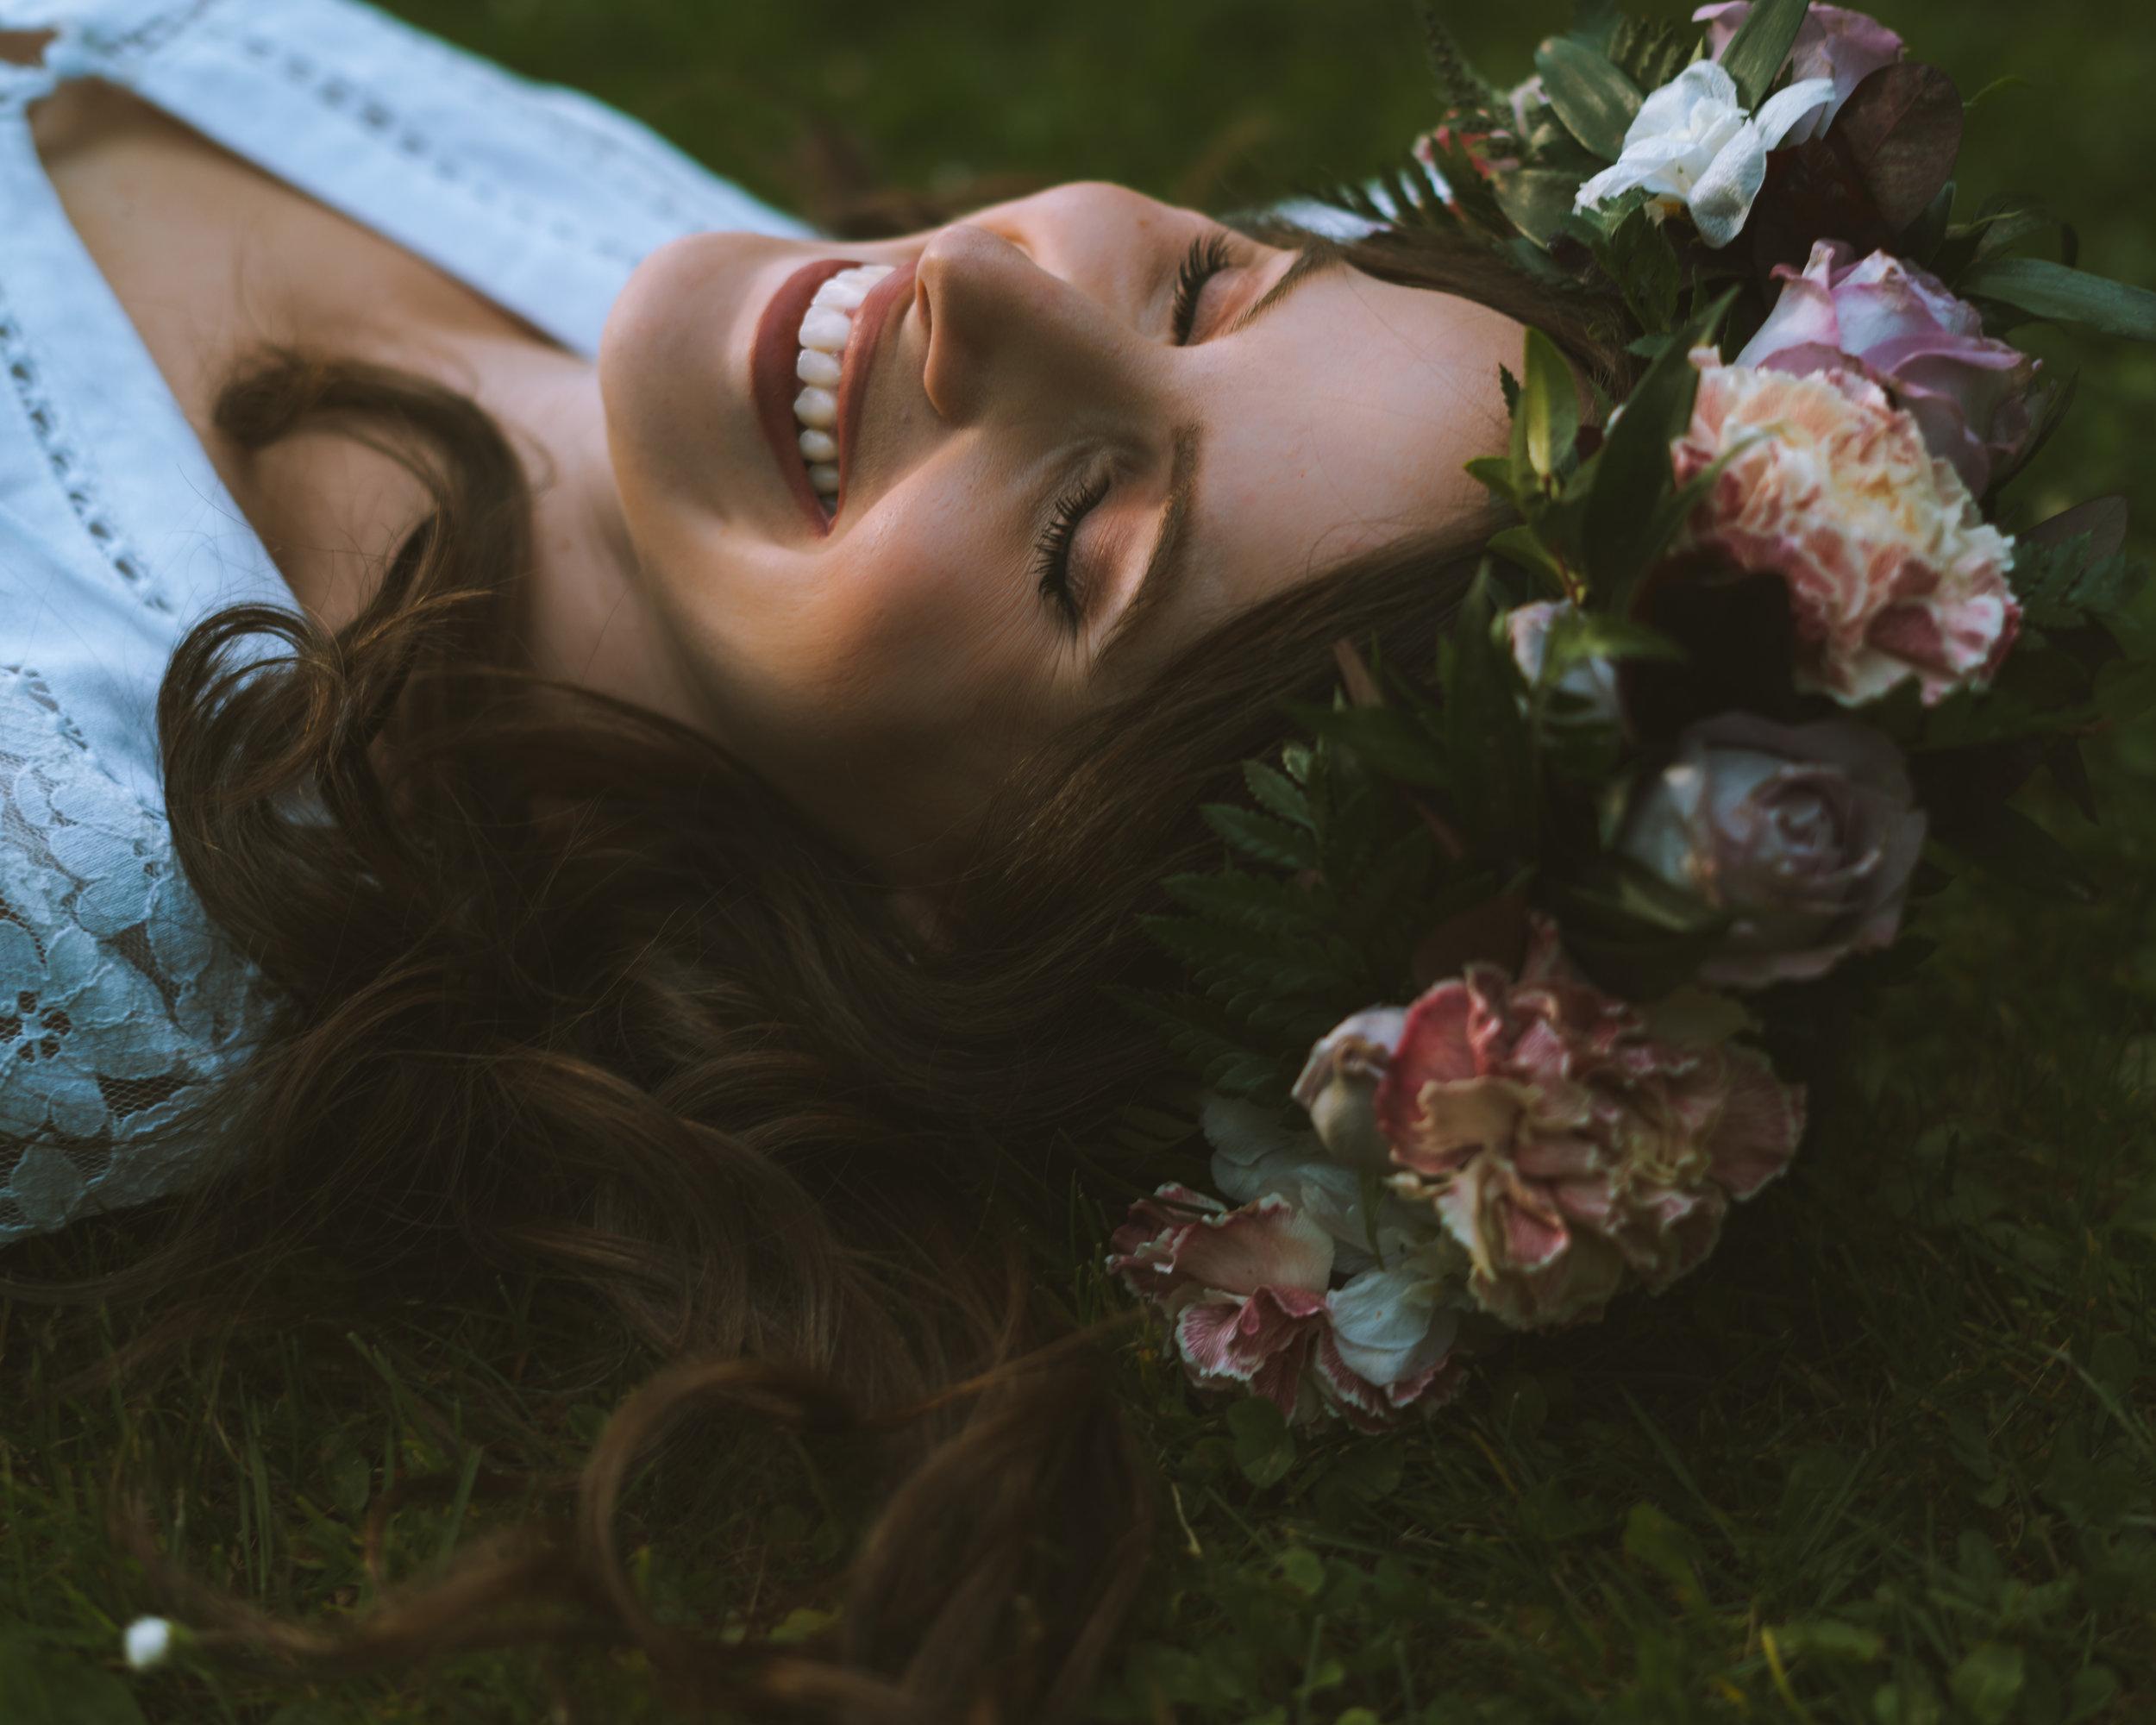 Vancouver-Canada-Travel-Elopement-Adventure-Wedding-Portrait-Photographer-Emma-Rae10.jpg